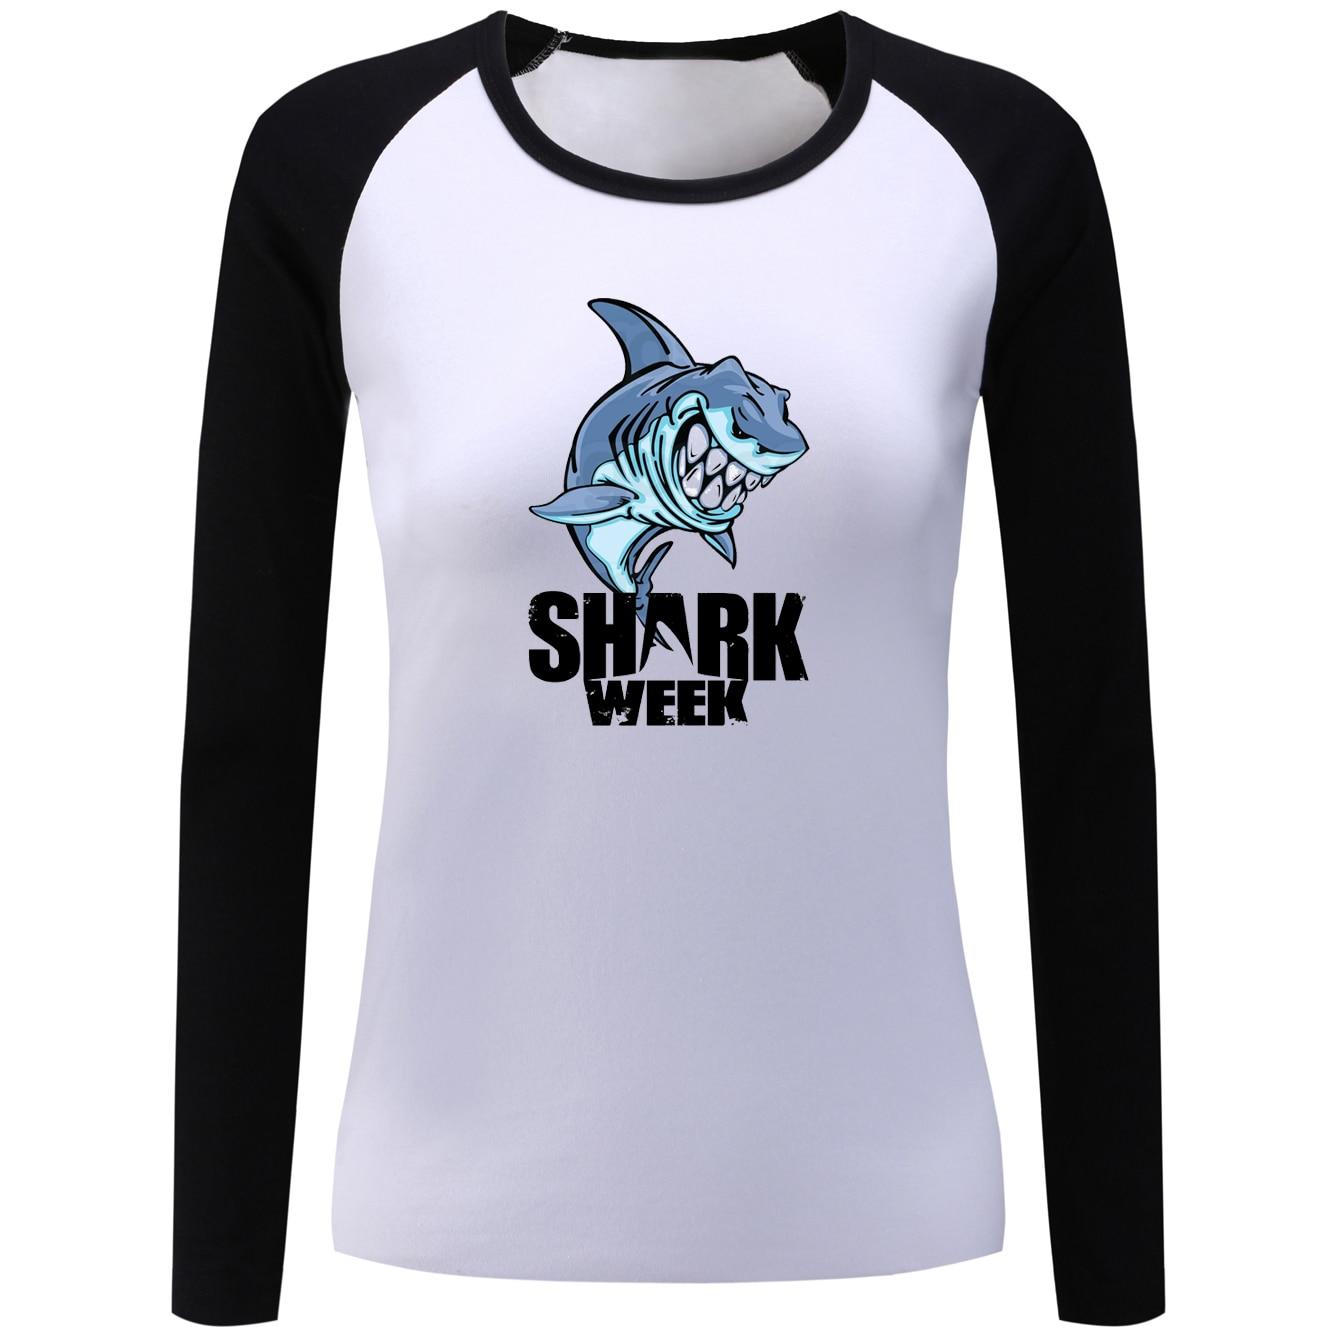 Design t shirt sample - Women S Girl S Shark Week Shark Design Raglan Long Sleeve T Shirt Sample Style T Shirts Loose Casual Tshirt Lady Plus Size Xxl